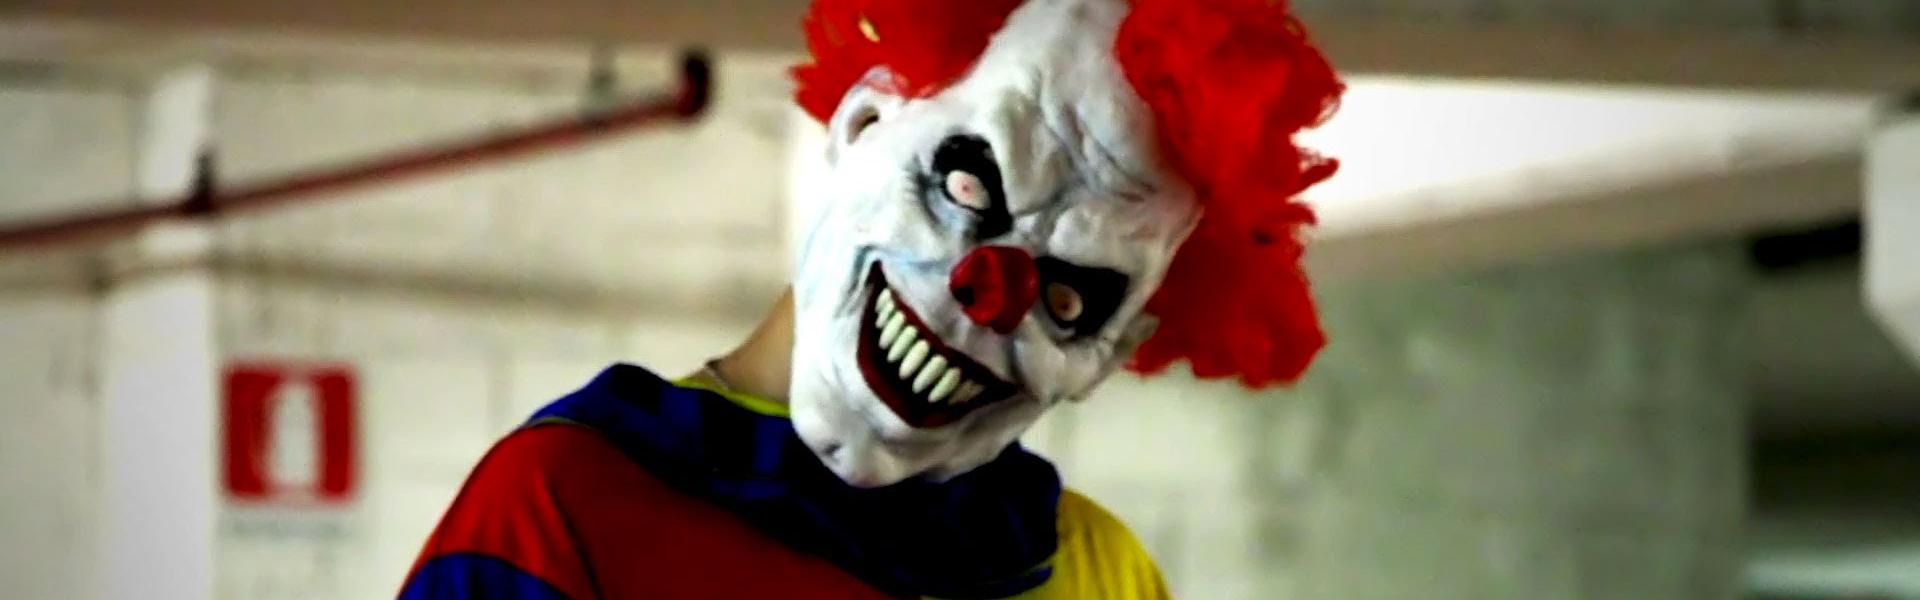 Clowntje3